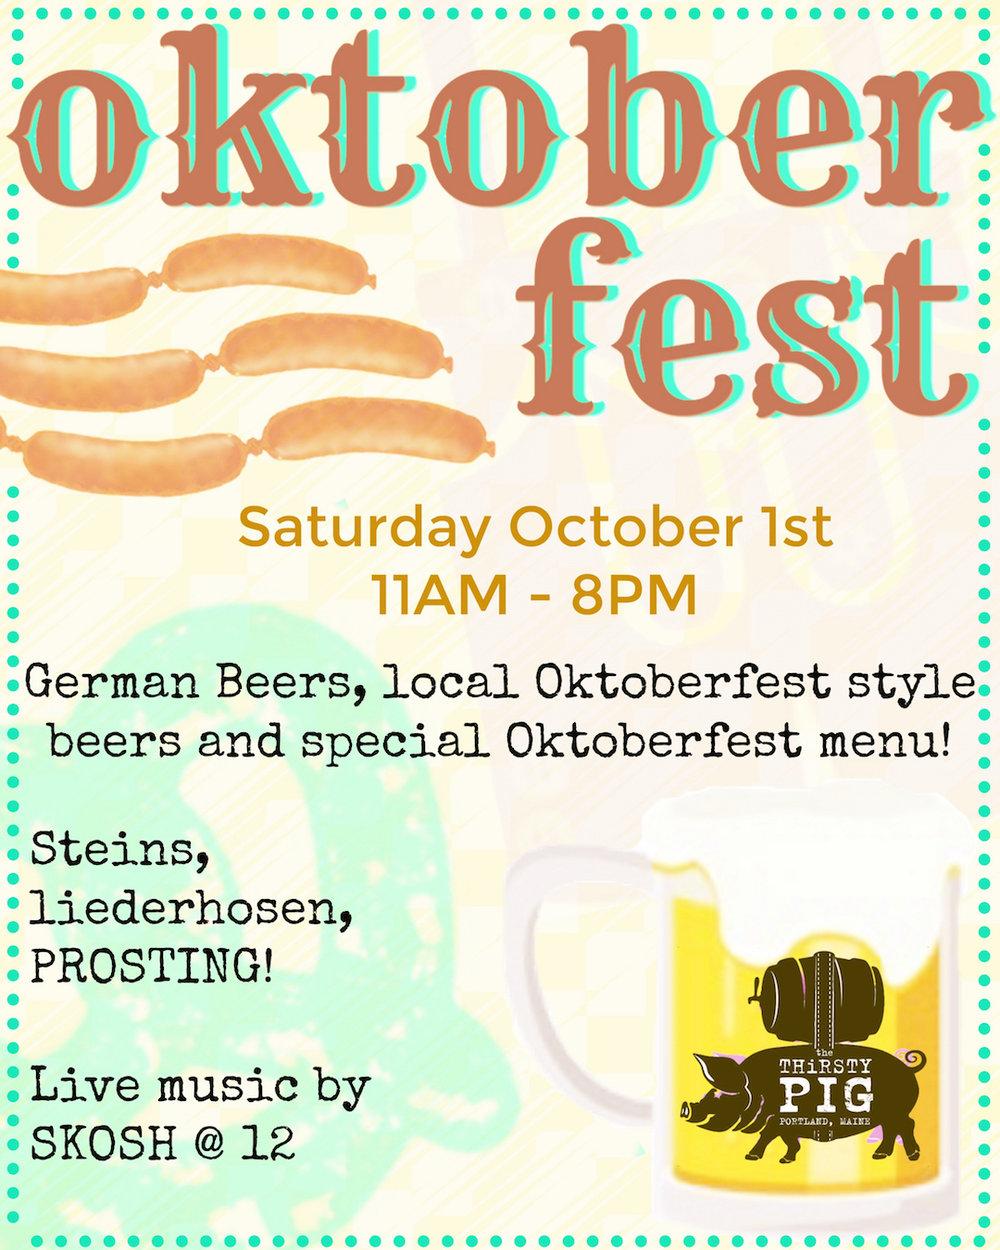 OktoberfestPoster_Final copy.jpg